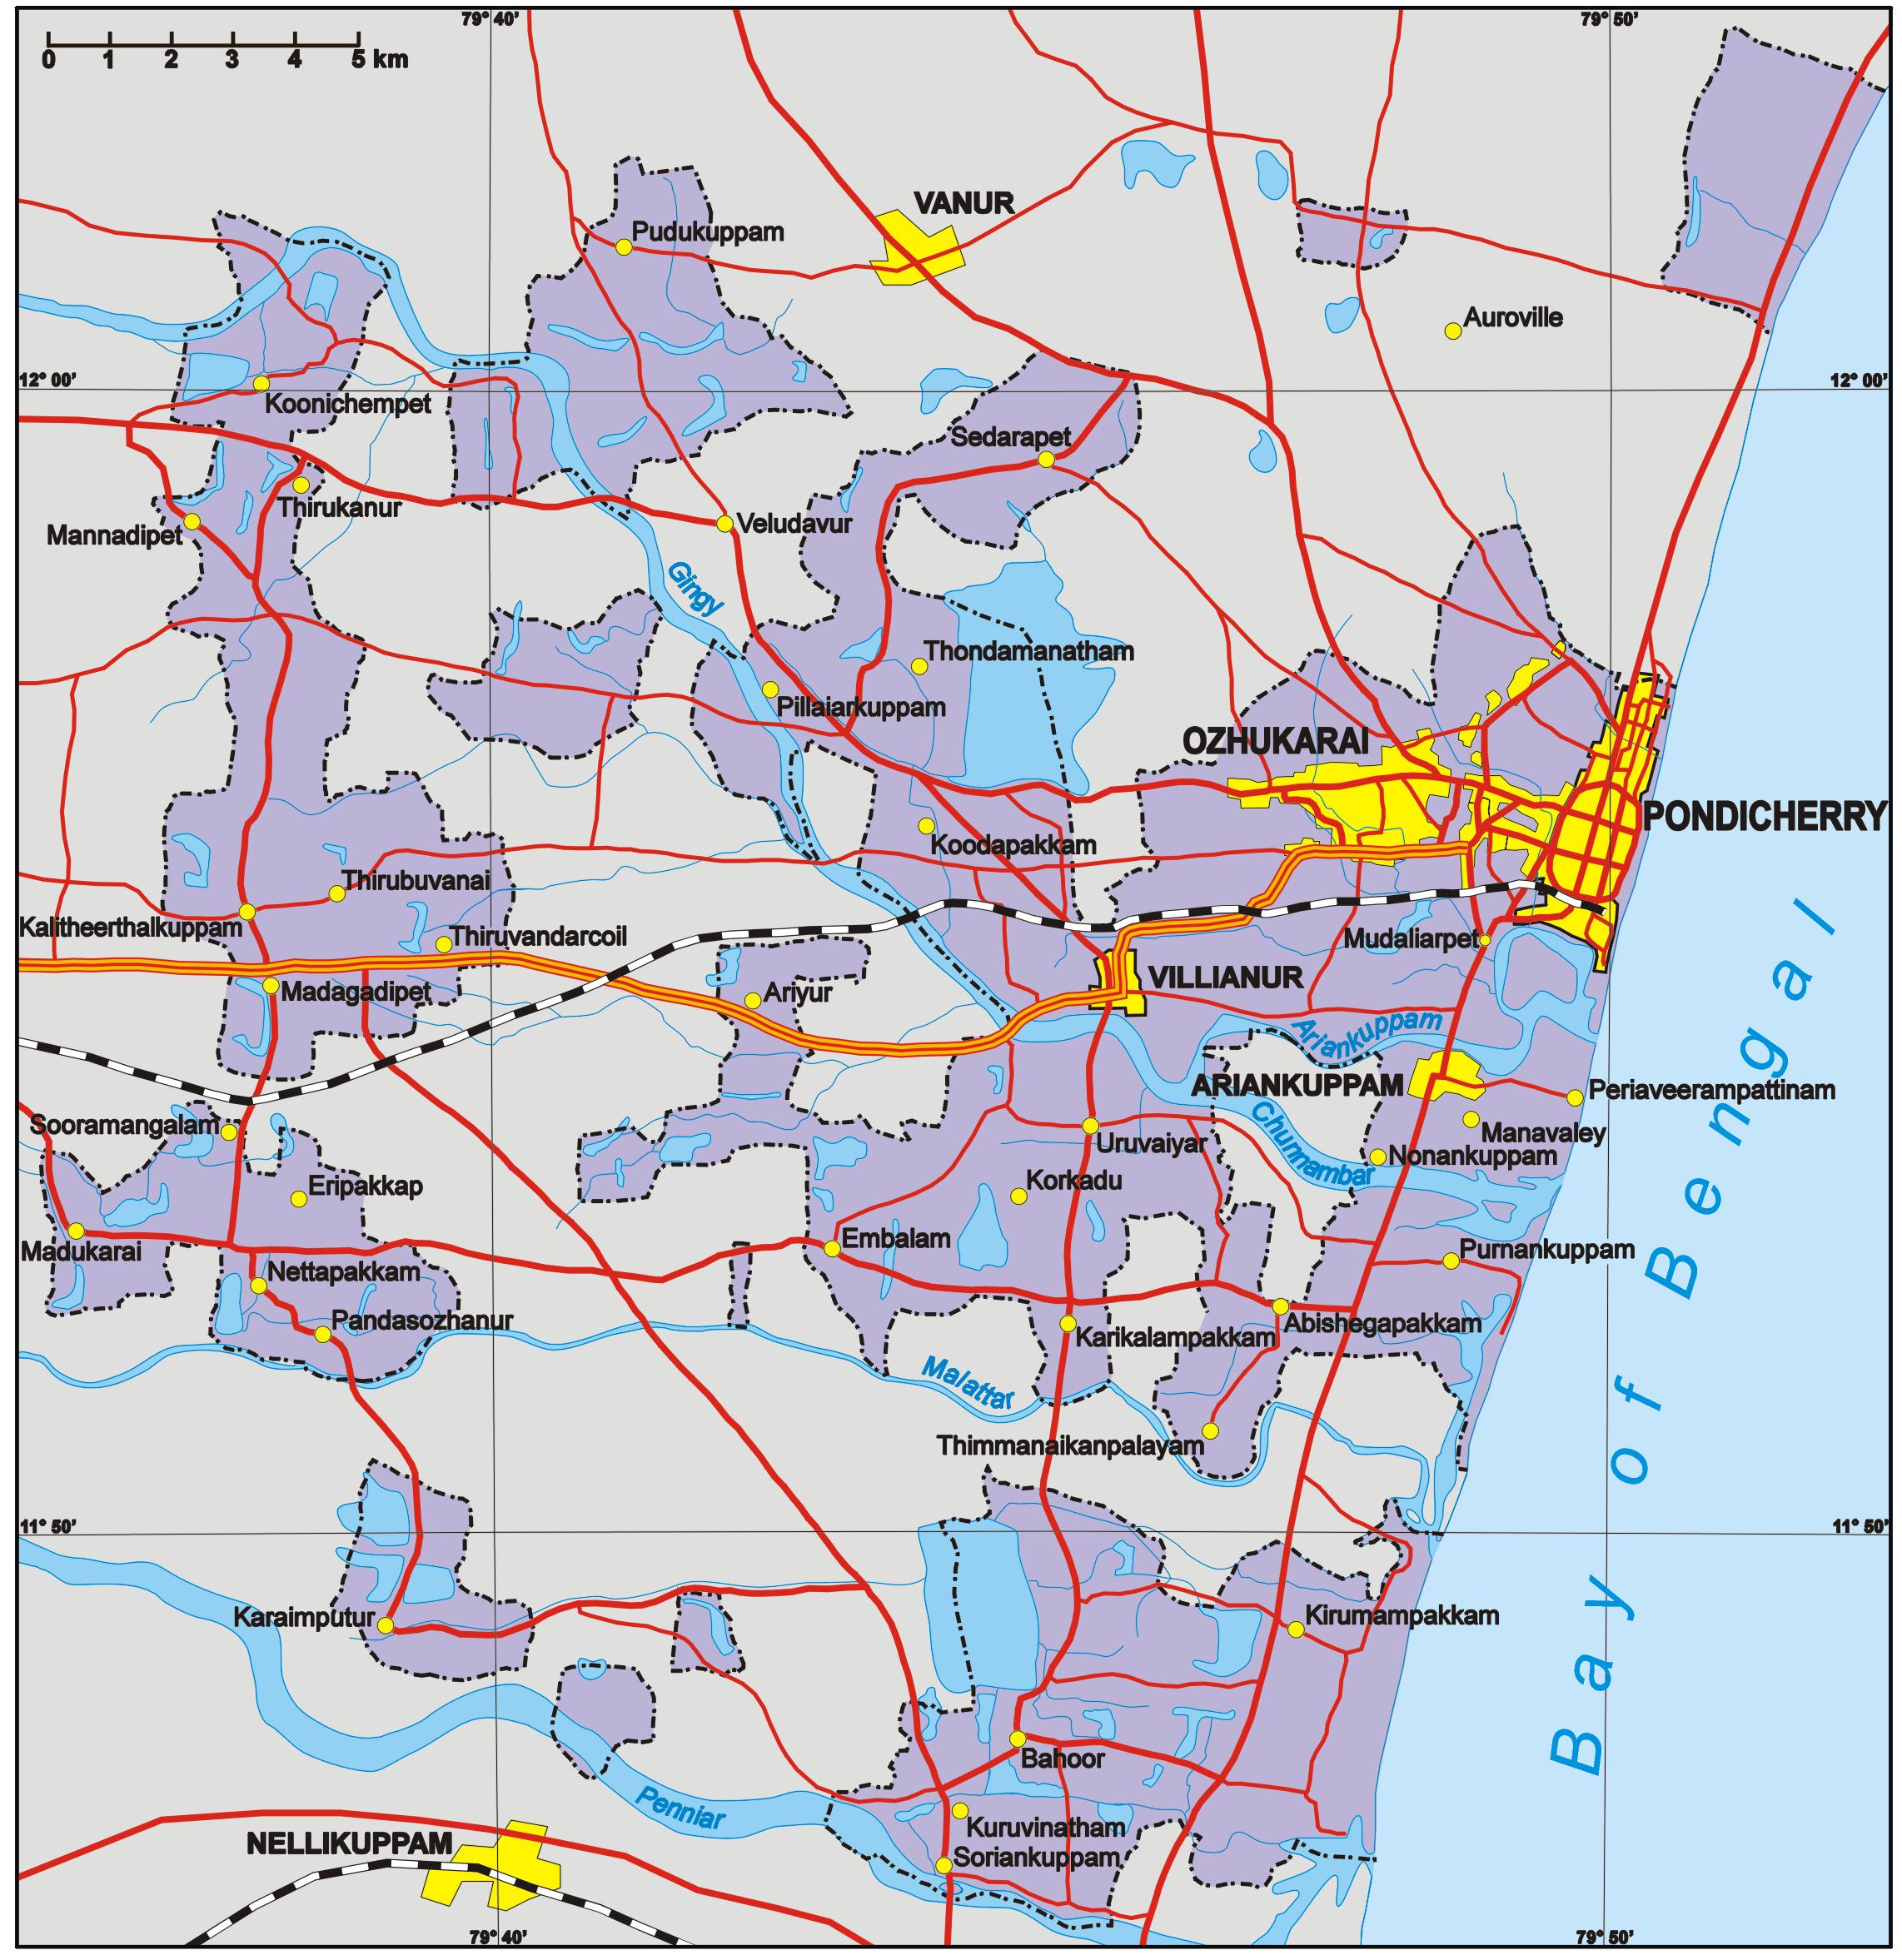 FilePondicherry Mappng Wikimedia Commons - Pondicherry map